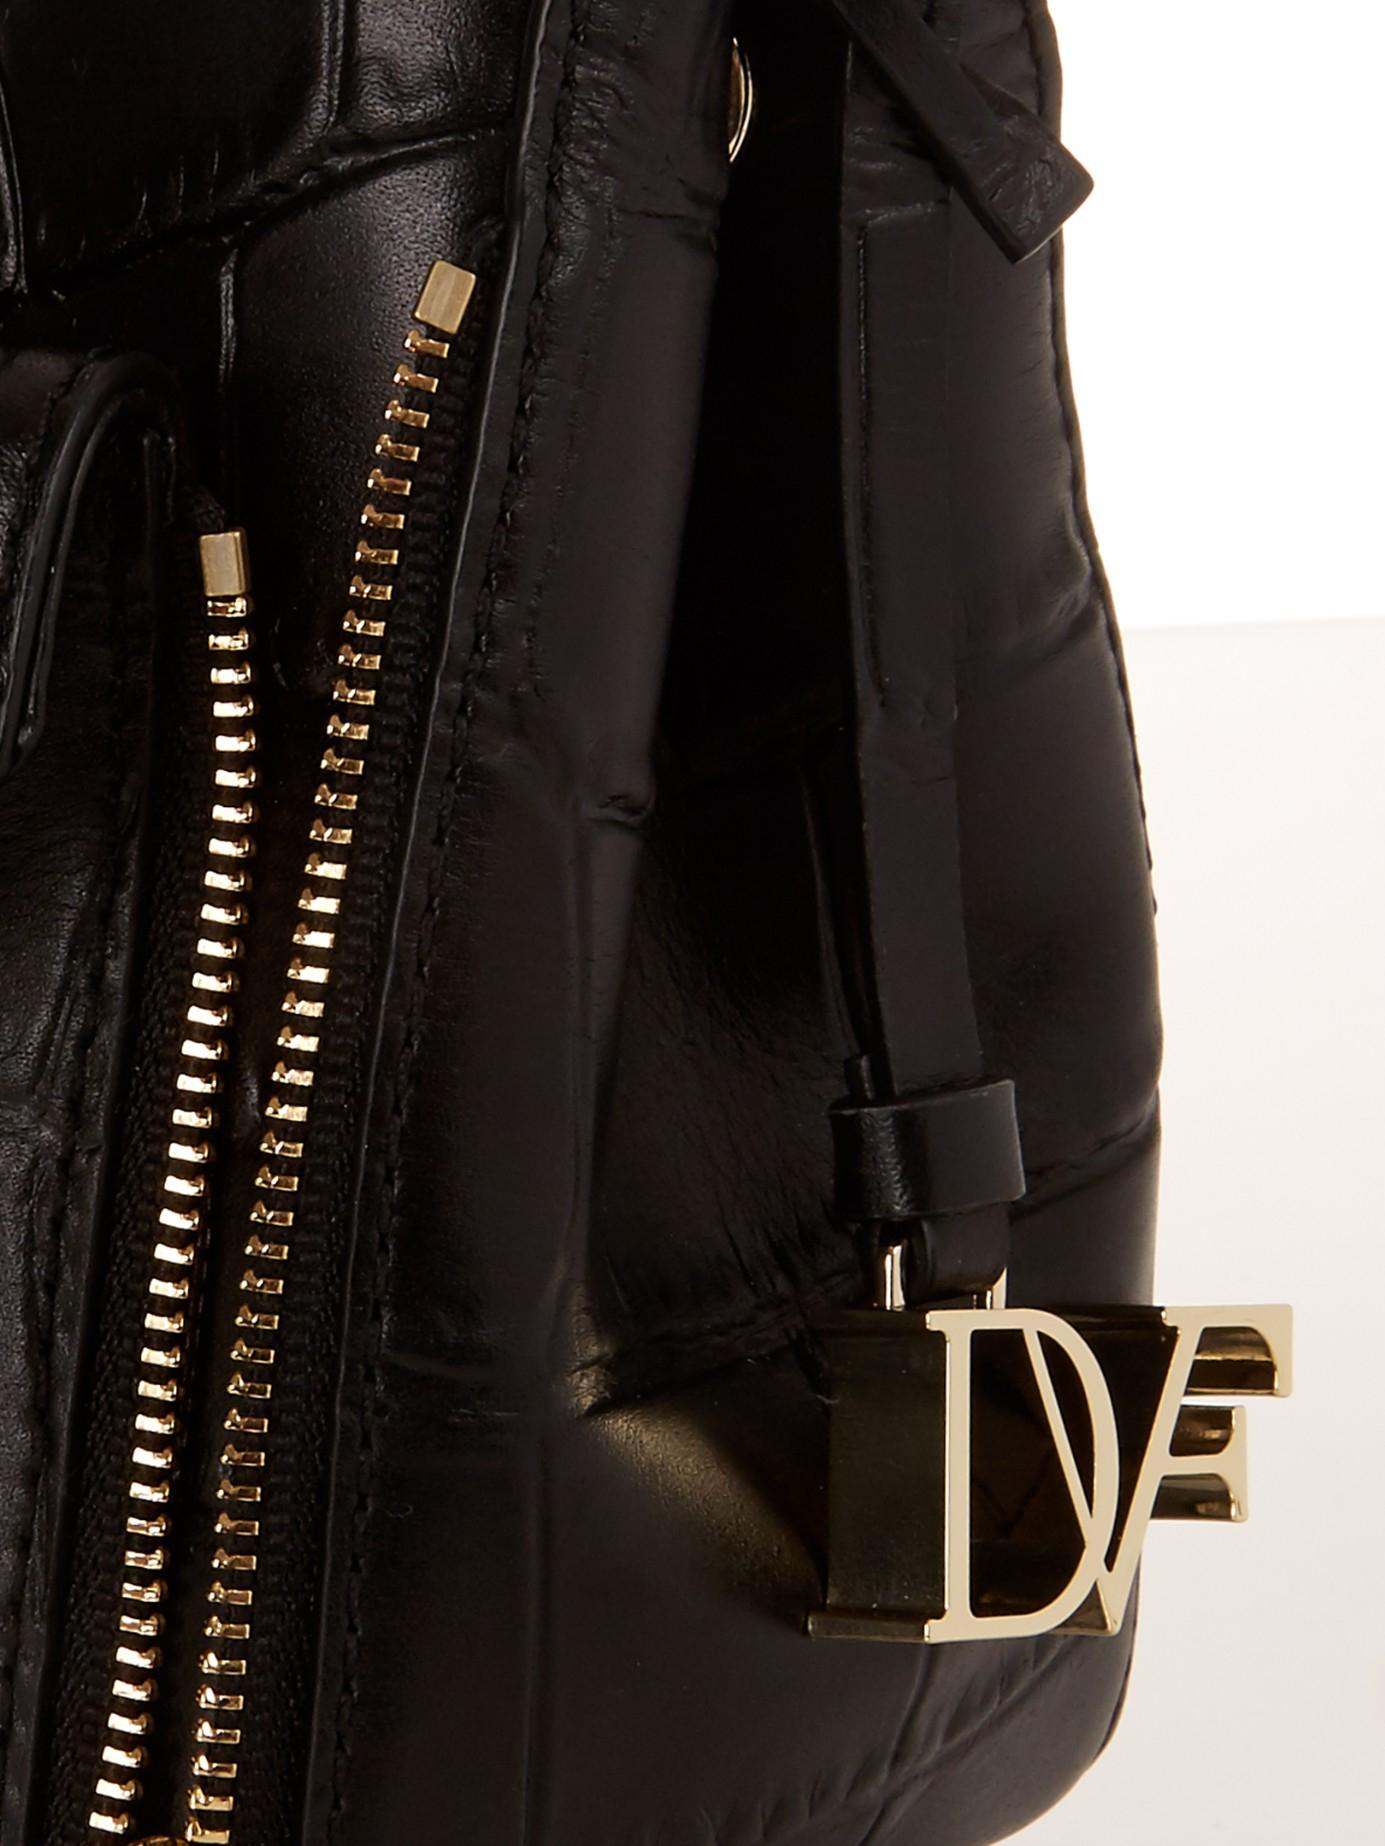 d24fa9c330 Lyst - Diane von Furstenberg 440 Gallery Mini Secret Agent Cross ...